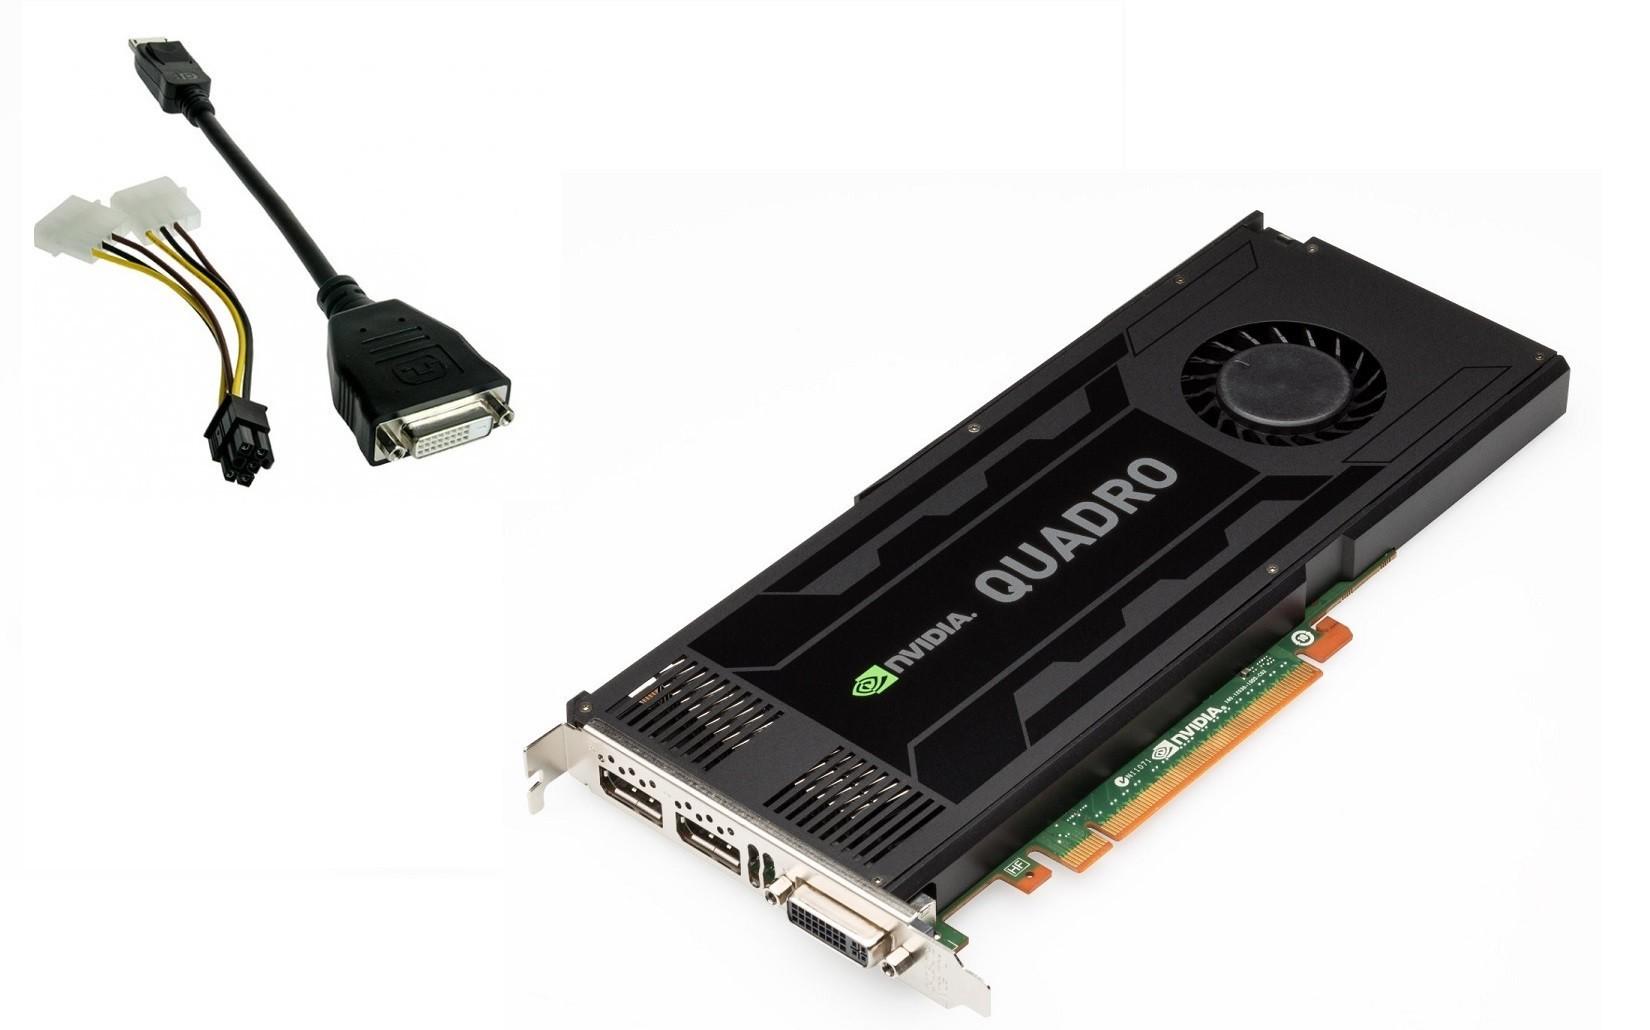 3GB Dell nVIDIA Quadro K4000 DVI-I 2x Display Ports GDDR5 PCI Express 2.0 x16 Graphic Card CN3GX